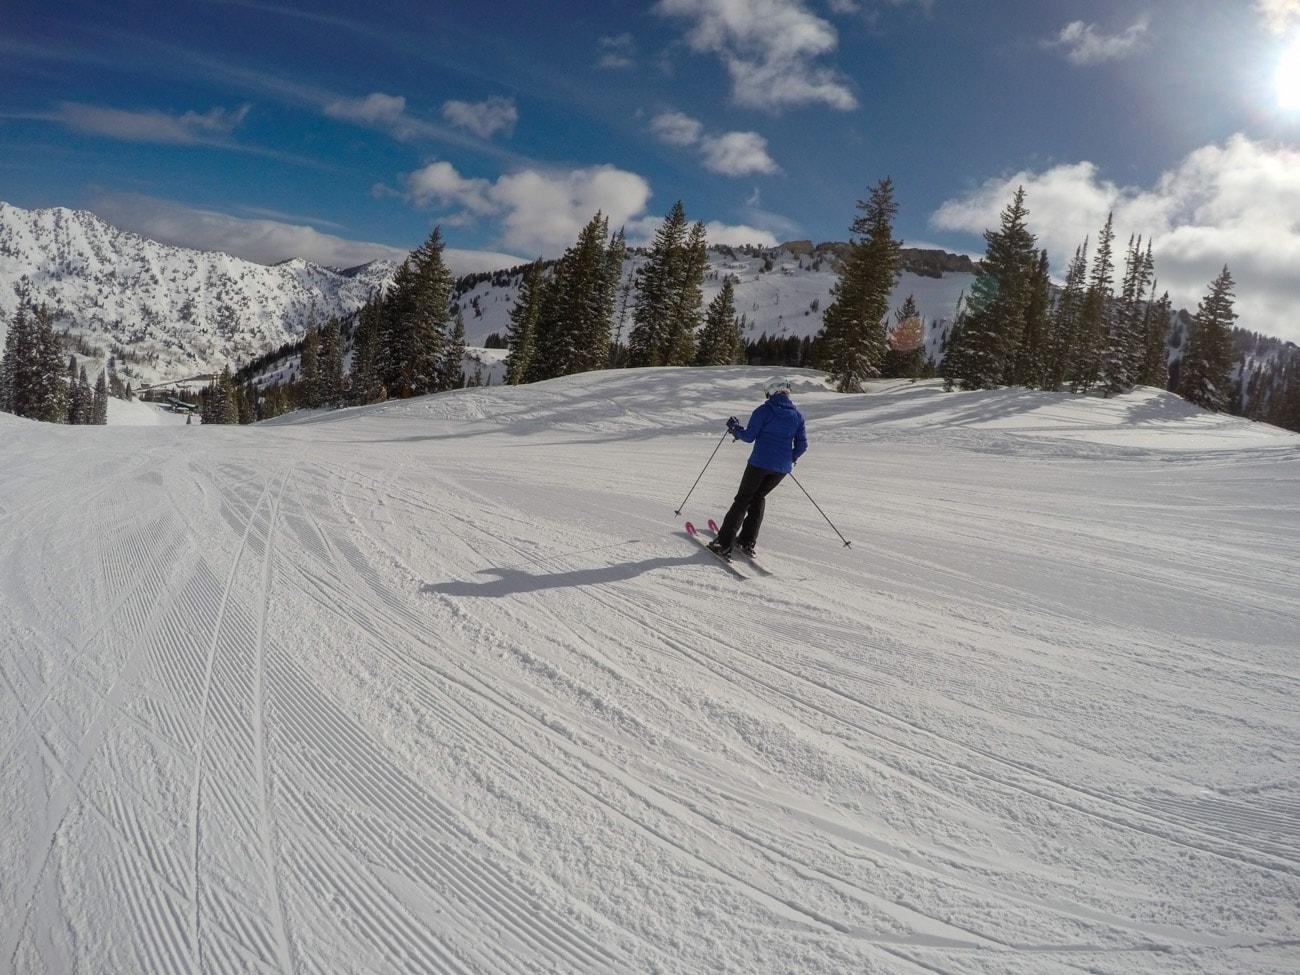 Learning how to ski at Alta Ski Area